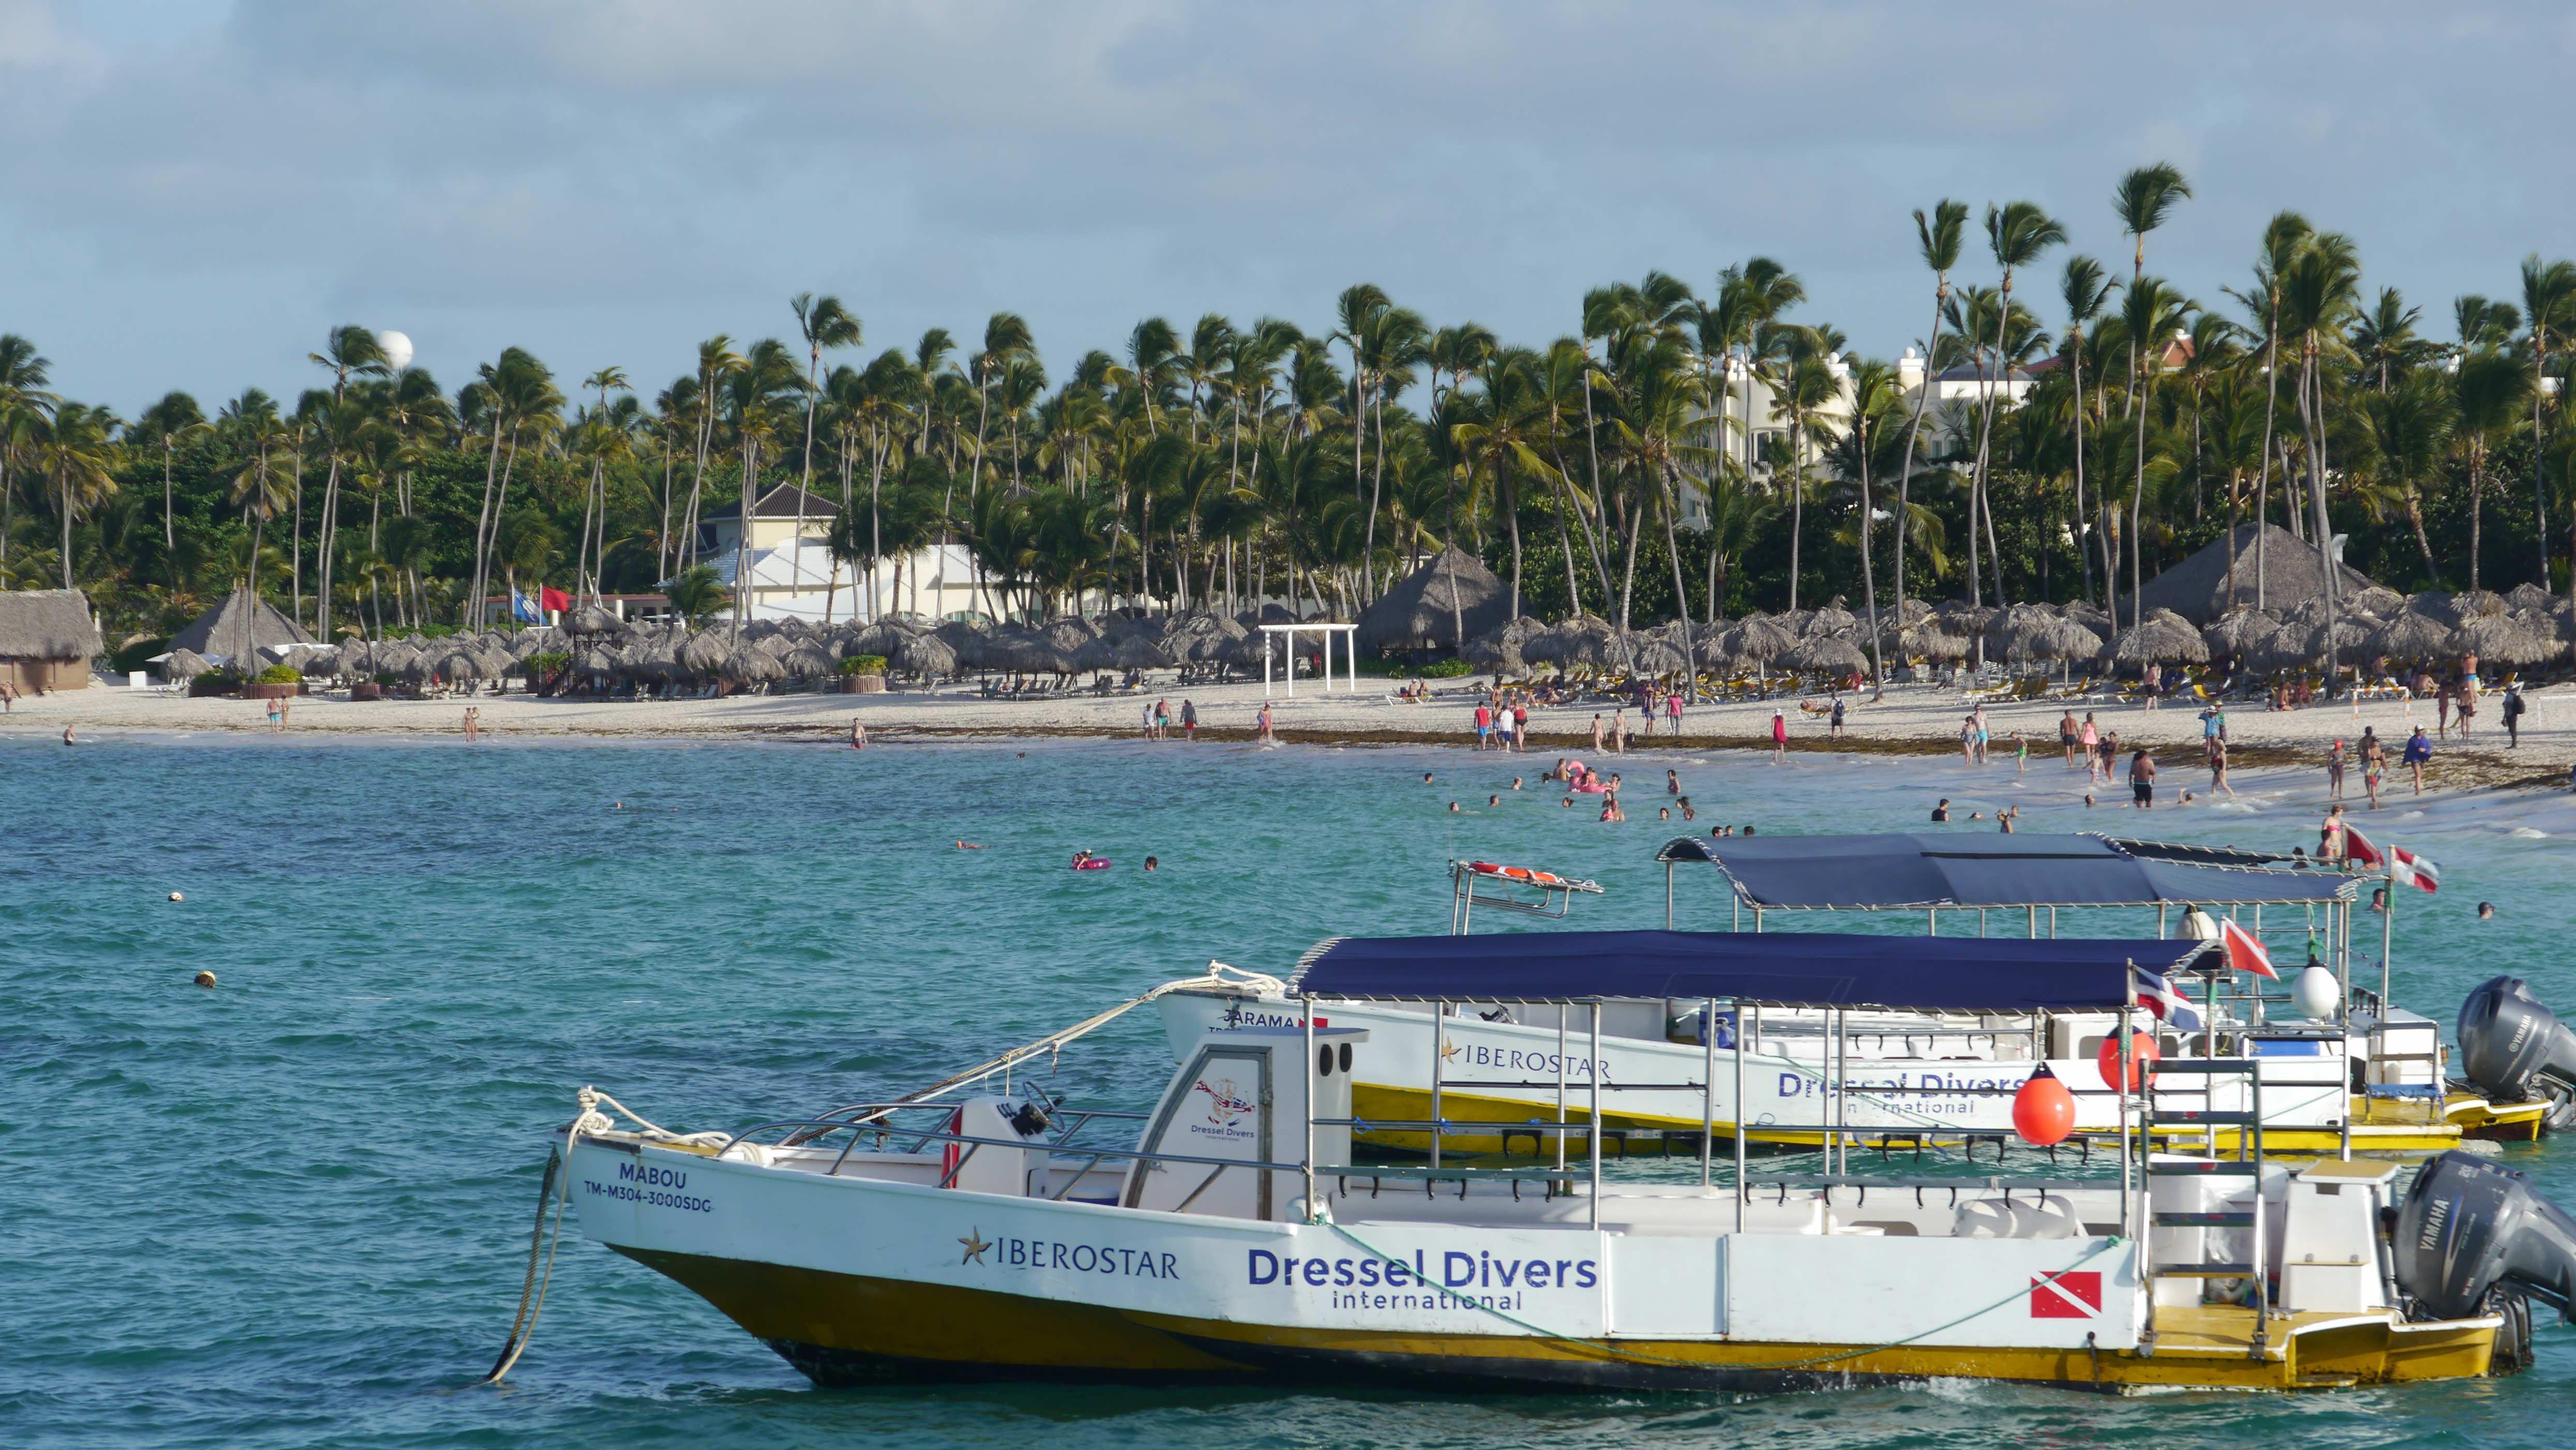 mejores consejos de buceo - dive boat